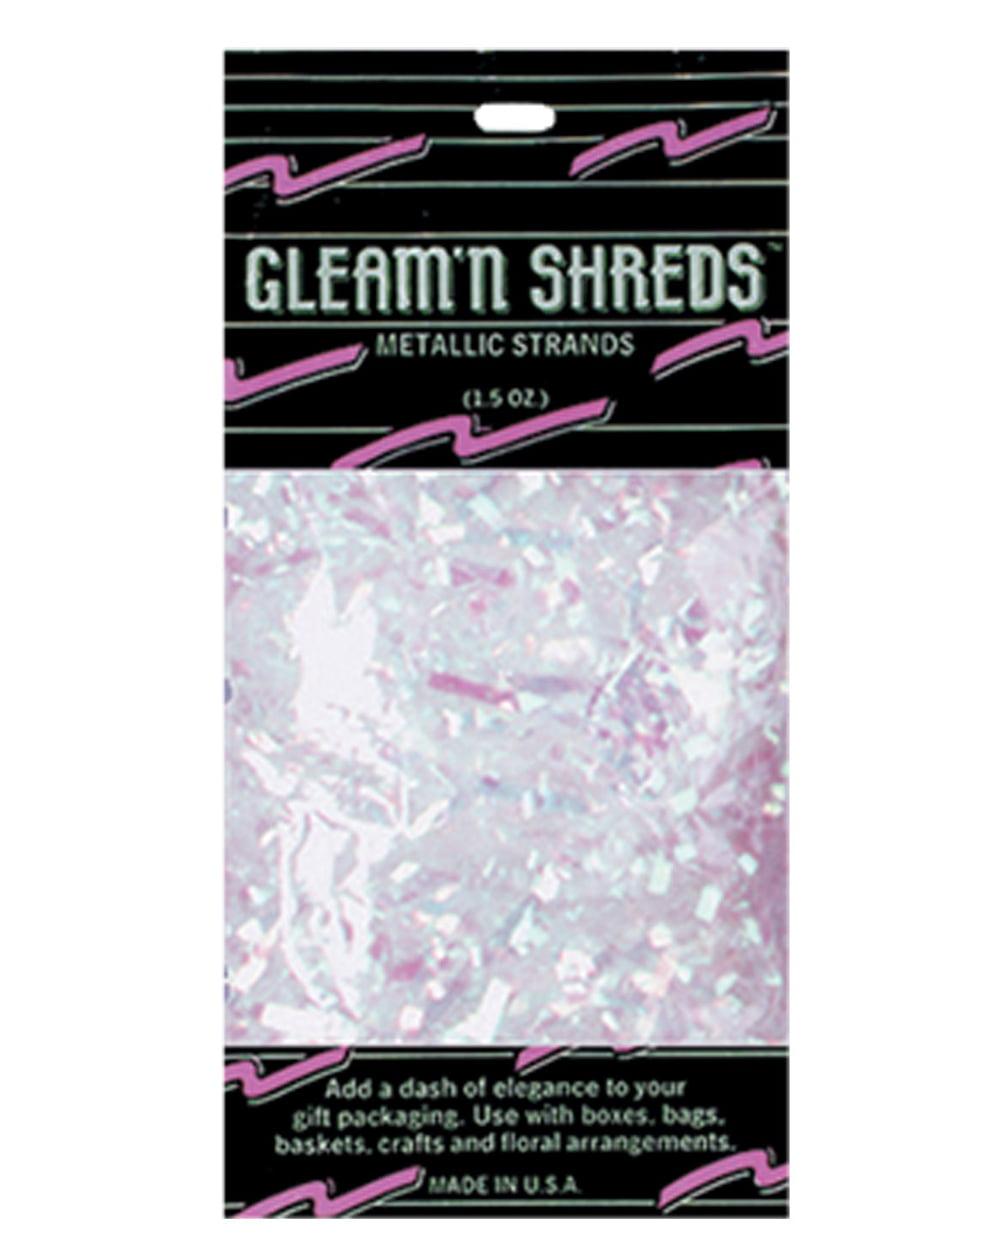 Gleam N Shreds Metallic Strands - Opalescent - CASE OF 24